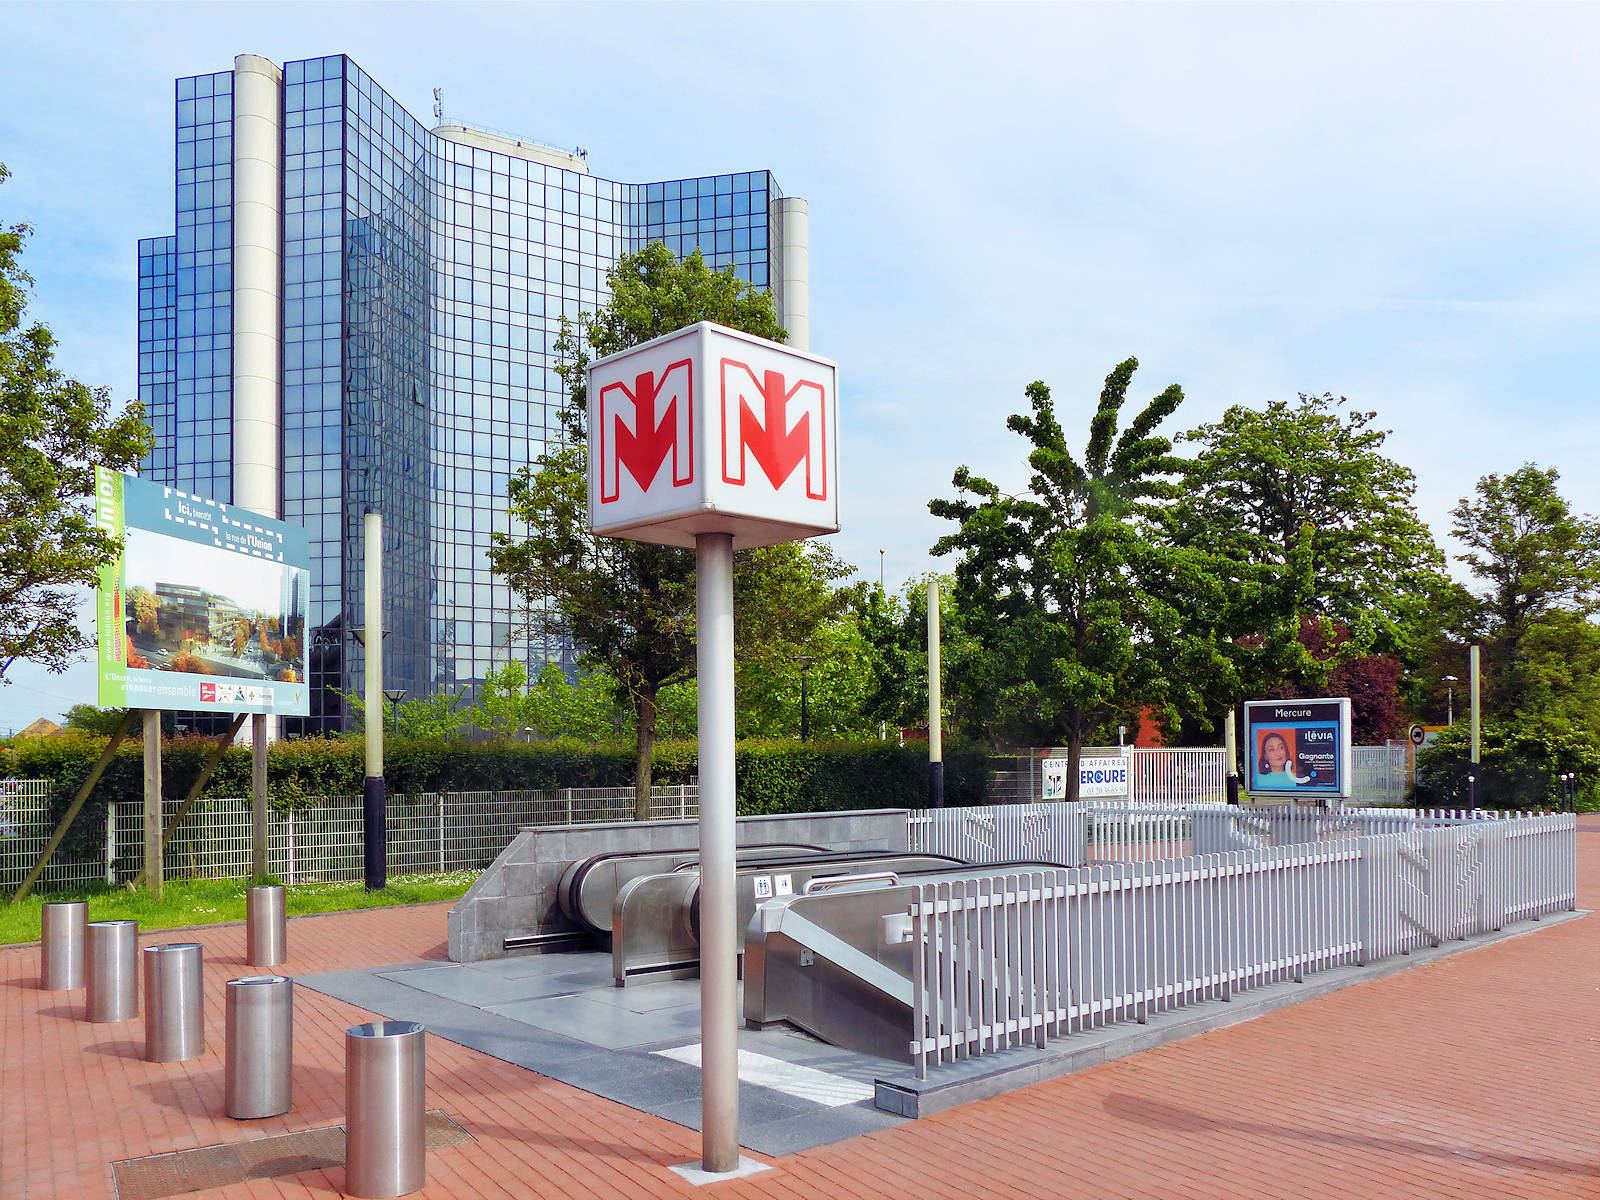 Métro Mercure, Tourcoing